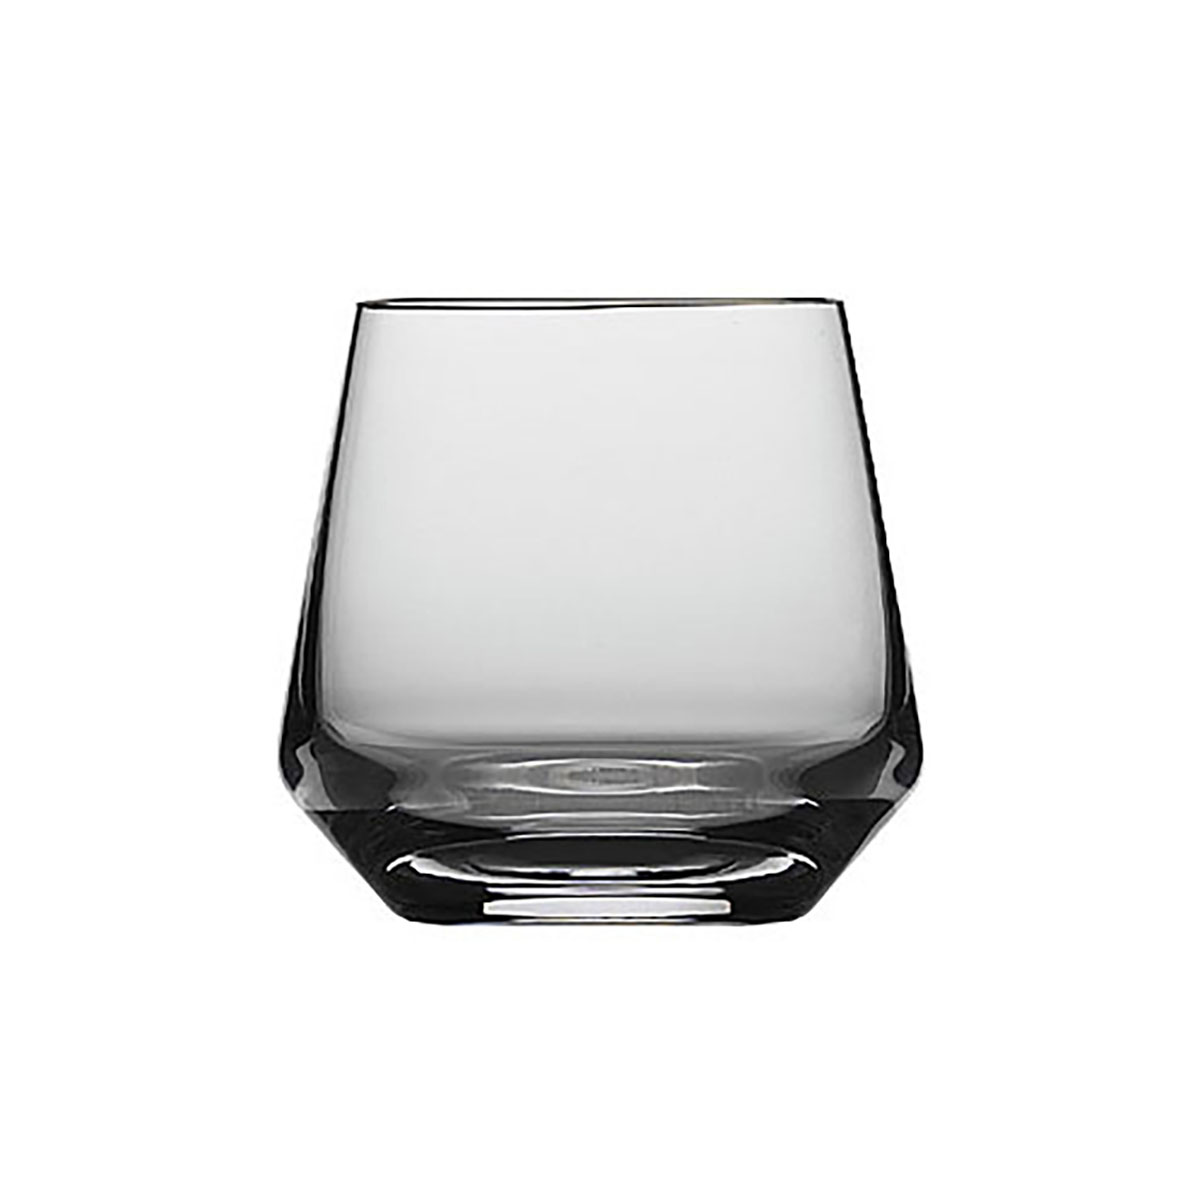 Schott Zwiesel Tritan Crystal, Pure Crystal Whiskey Glass, Set of Six